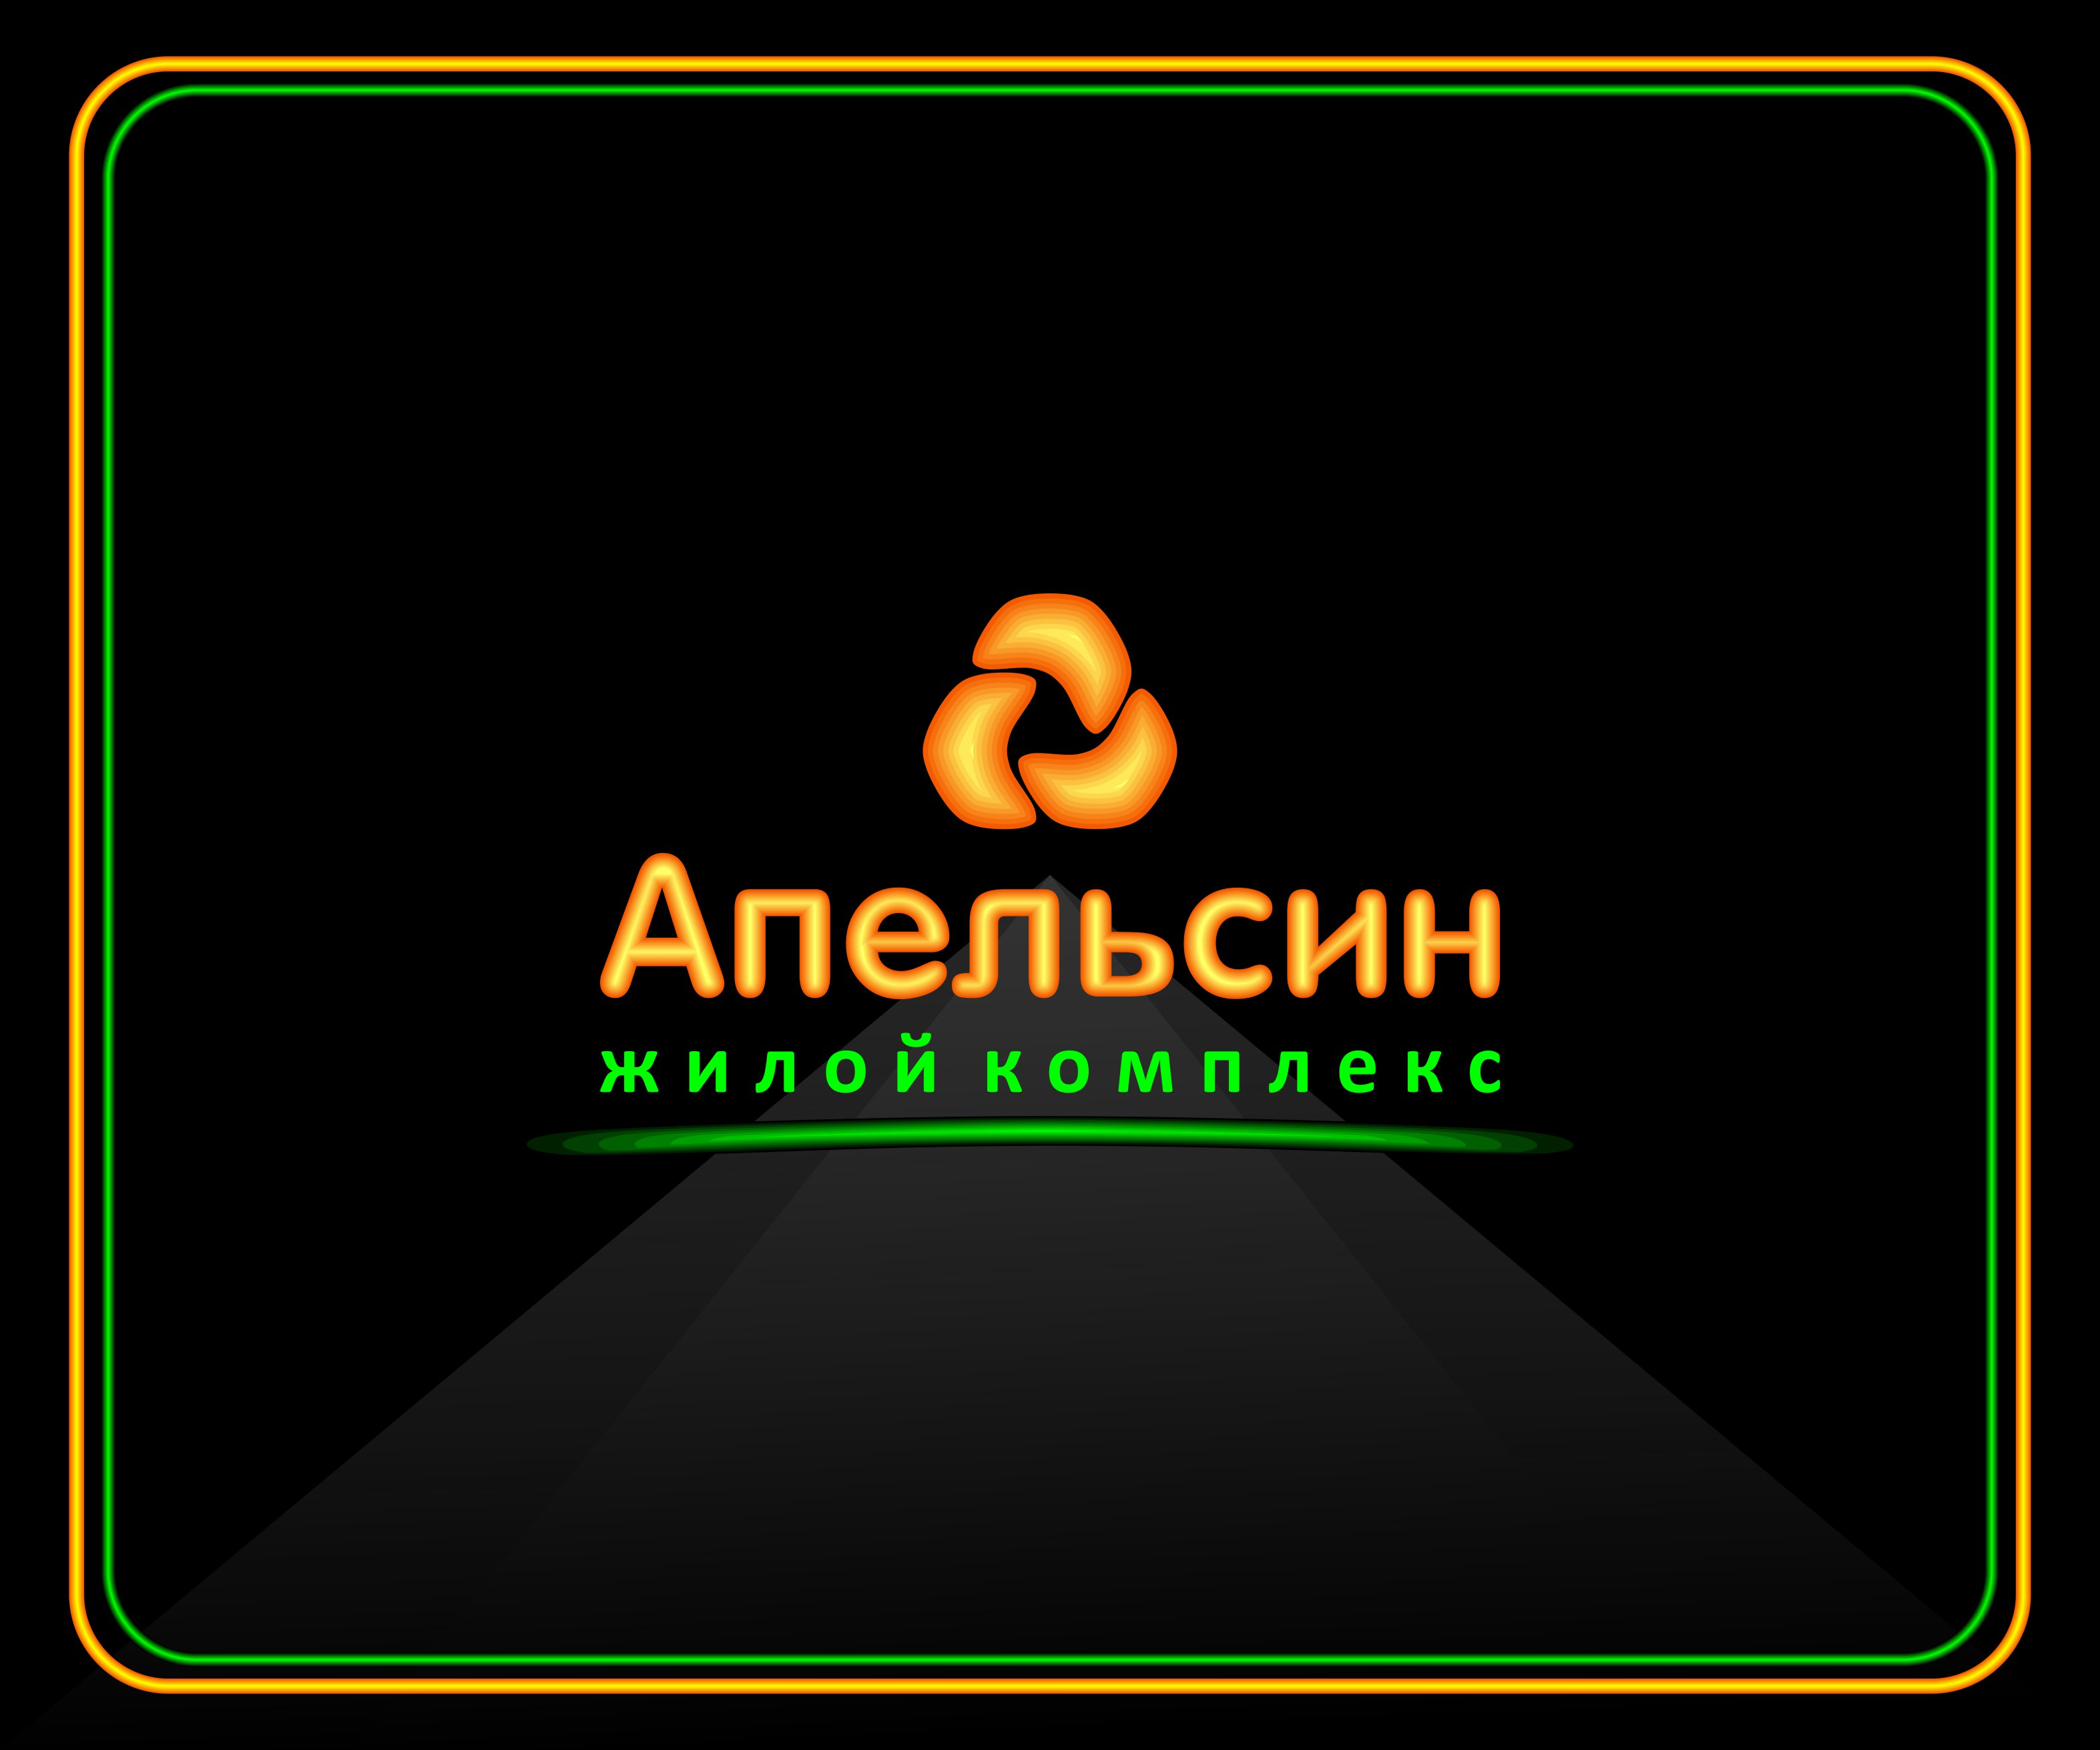 Логотип и фирменный стиль фото f_0505a6c6ee5d0f3c.jpg